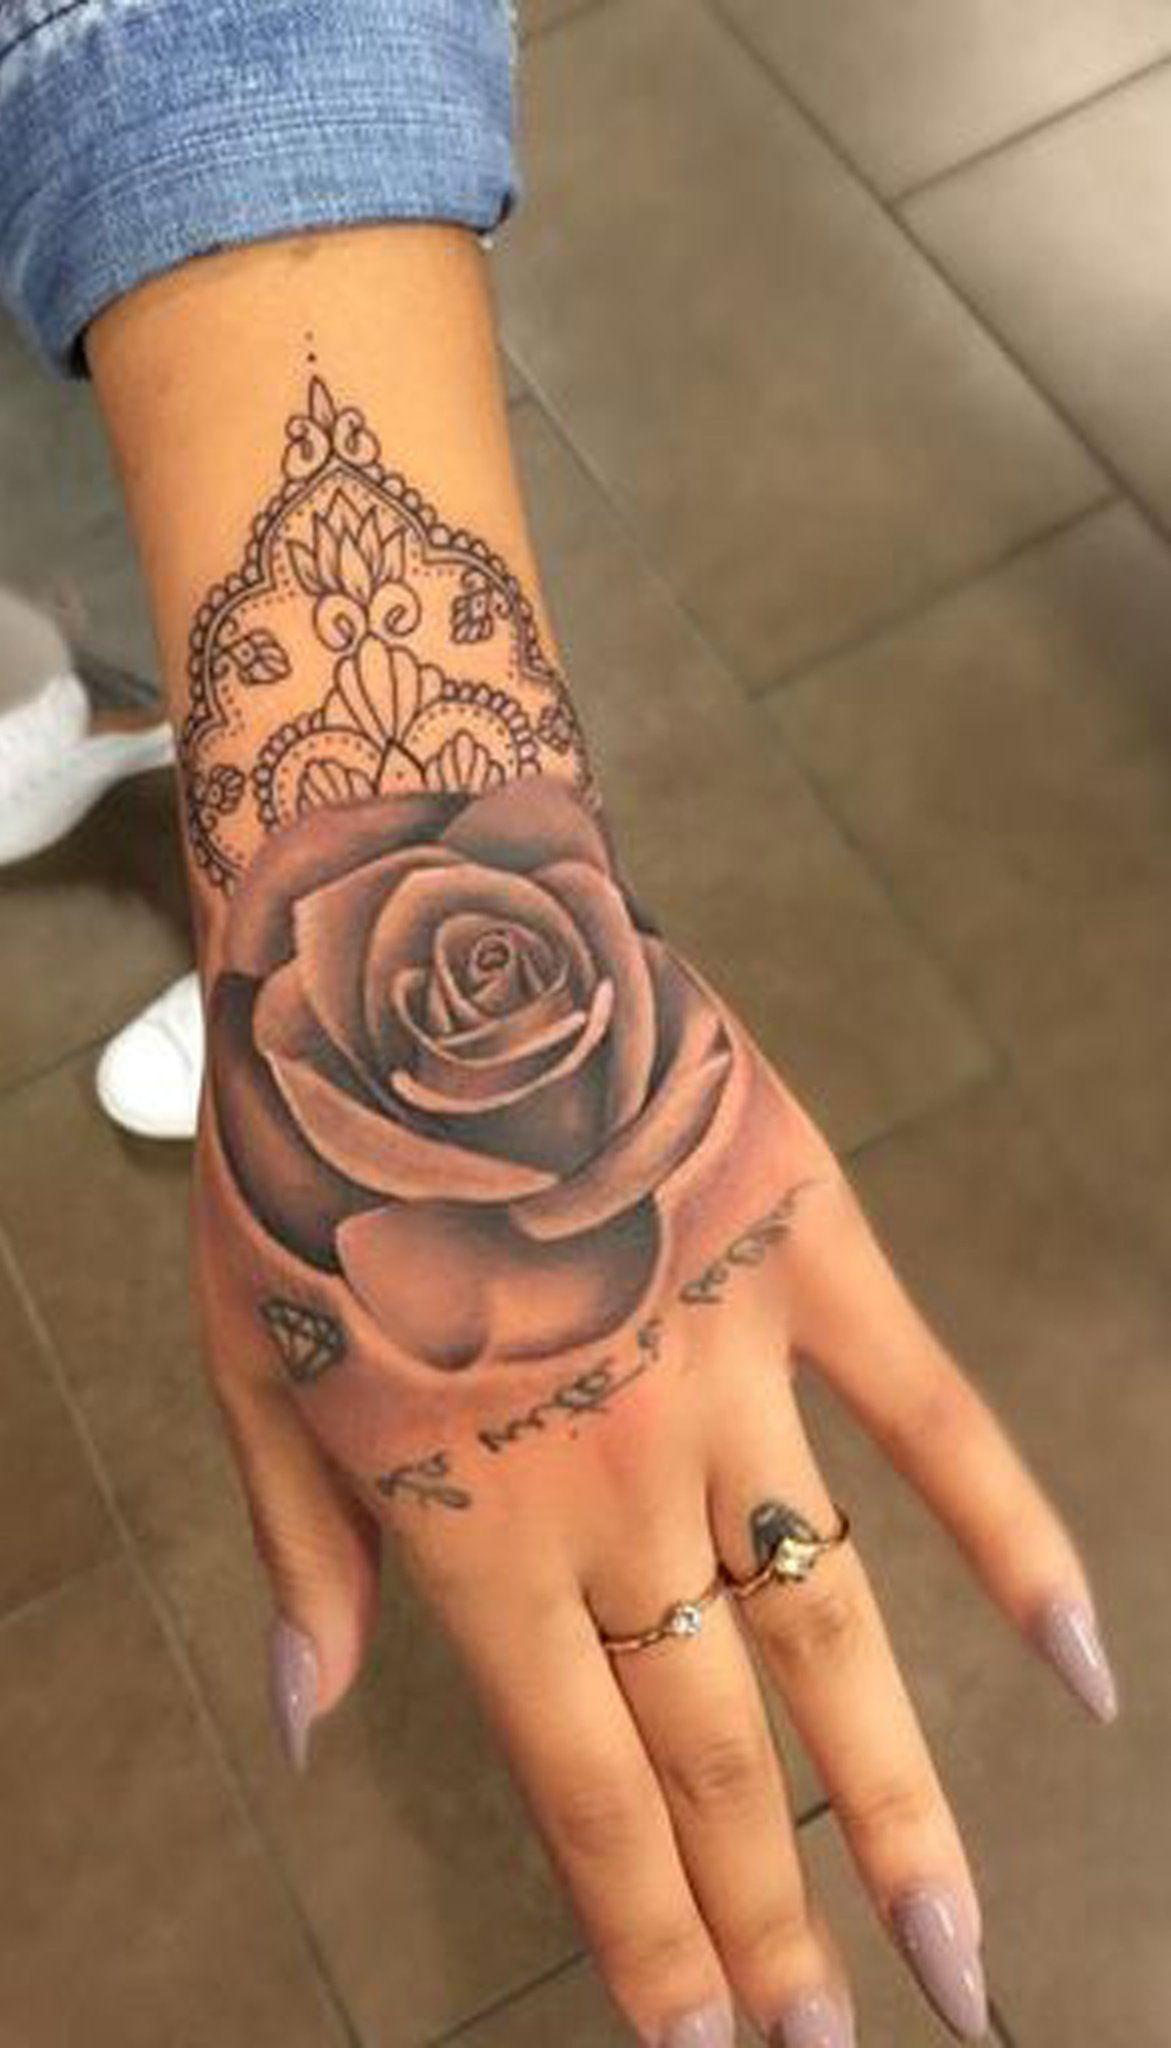 Geometric Rose Hand Tattoo Ideas For Women Unique Watercolor Mandala Tat Www Mybodiart Com Tattoos Rose Hand Tattoo Tattoos Hand Tattoos For Women